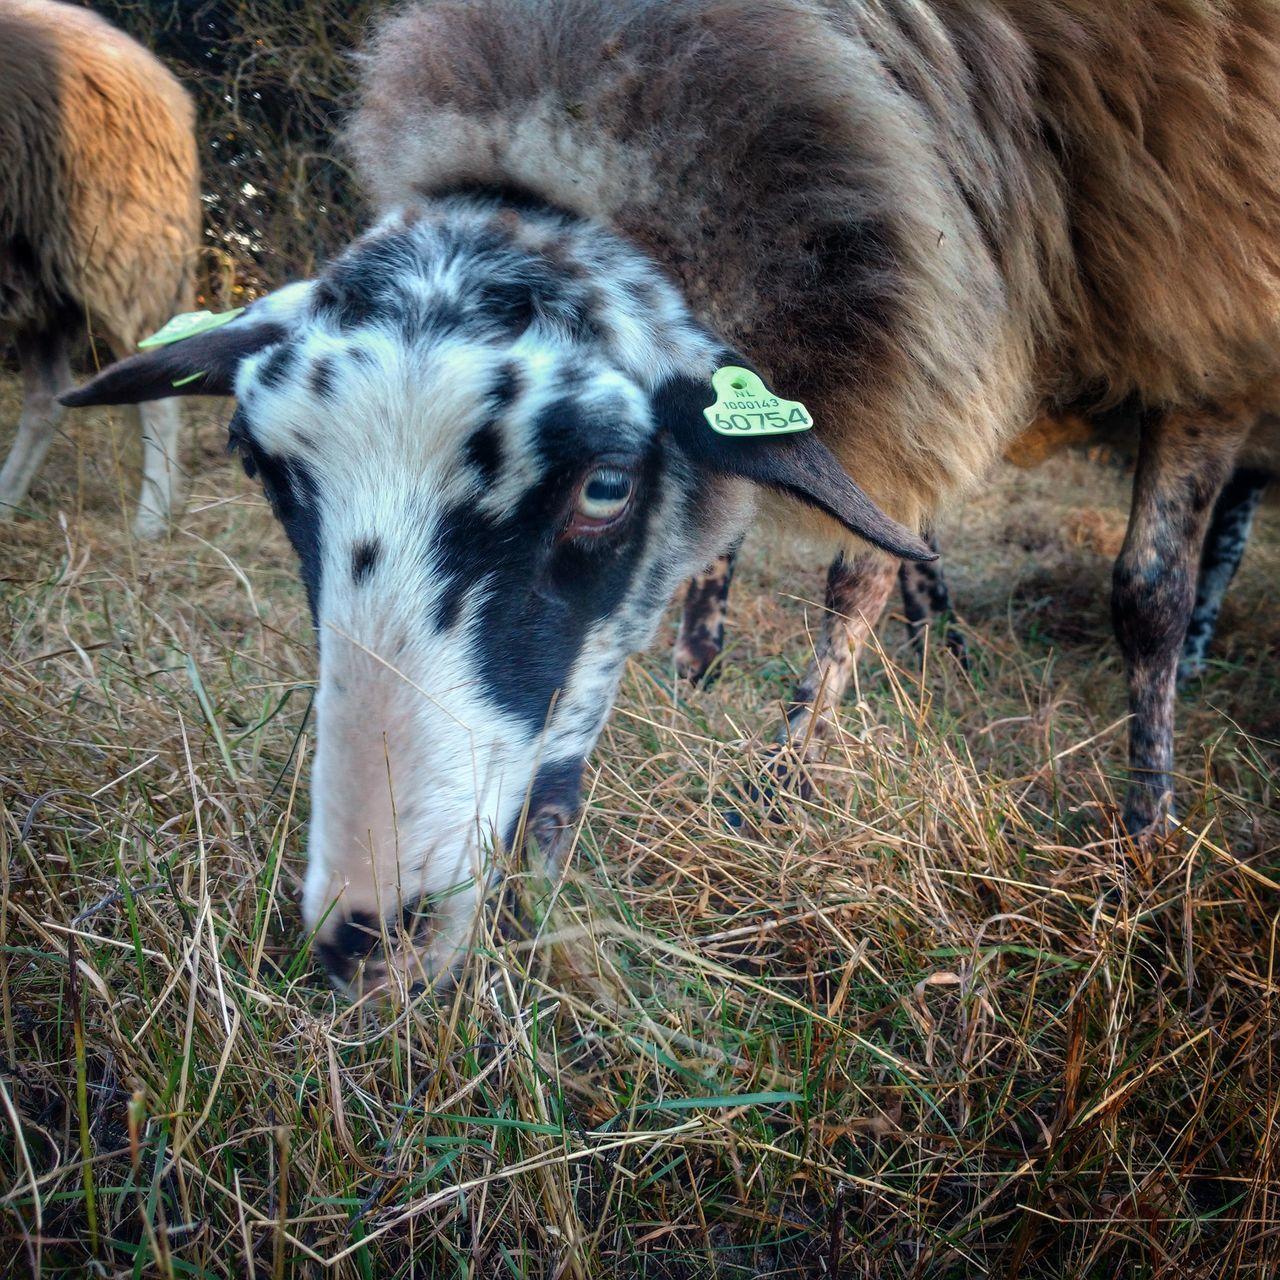 Portrait Of Sheep Grazing On Grassy Field